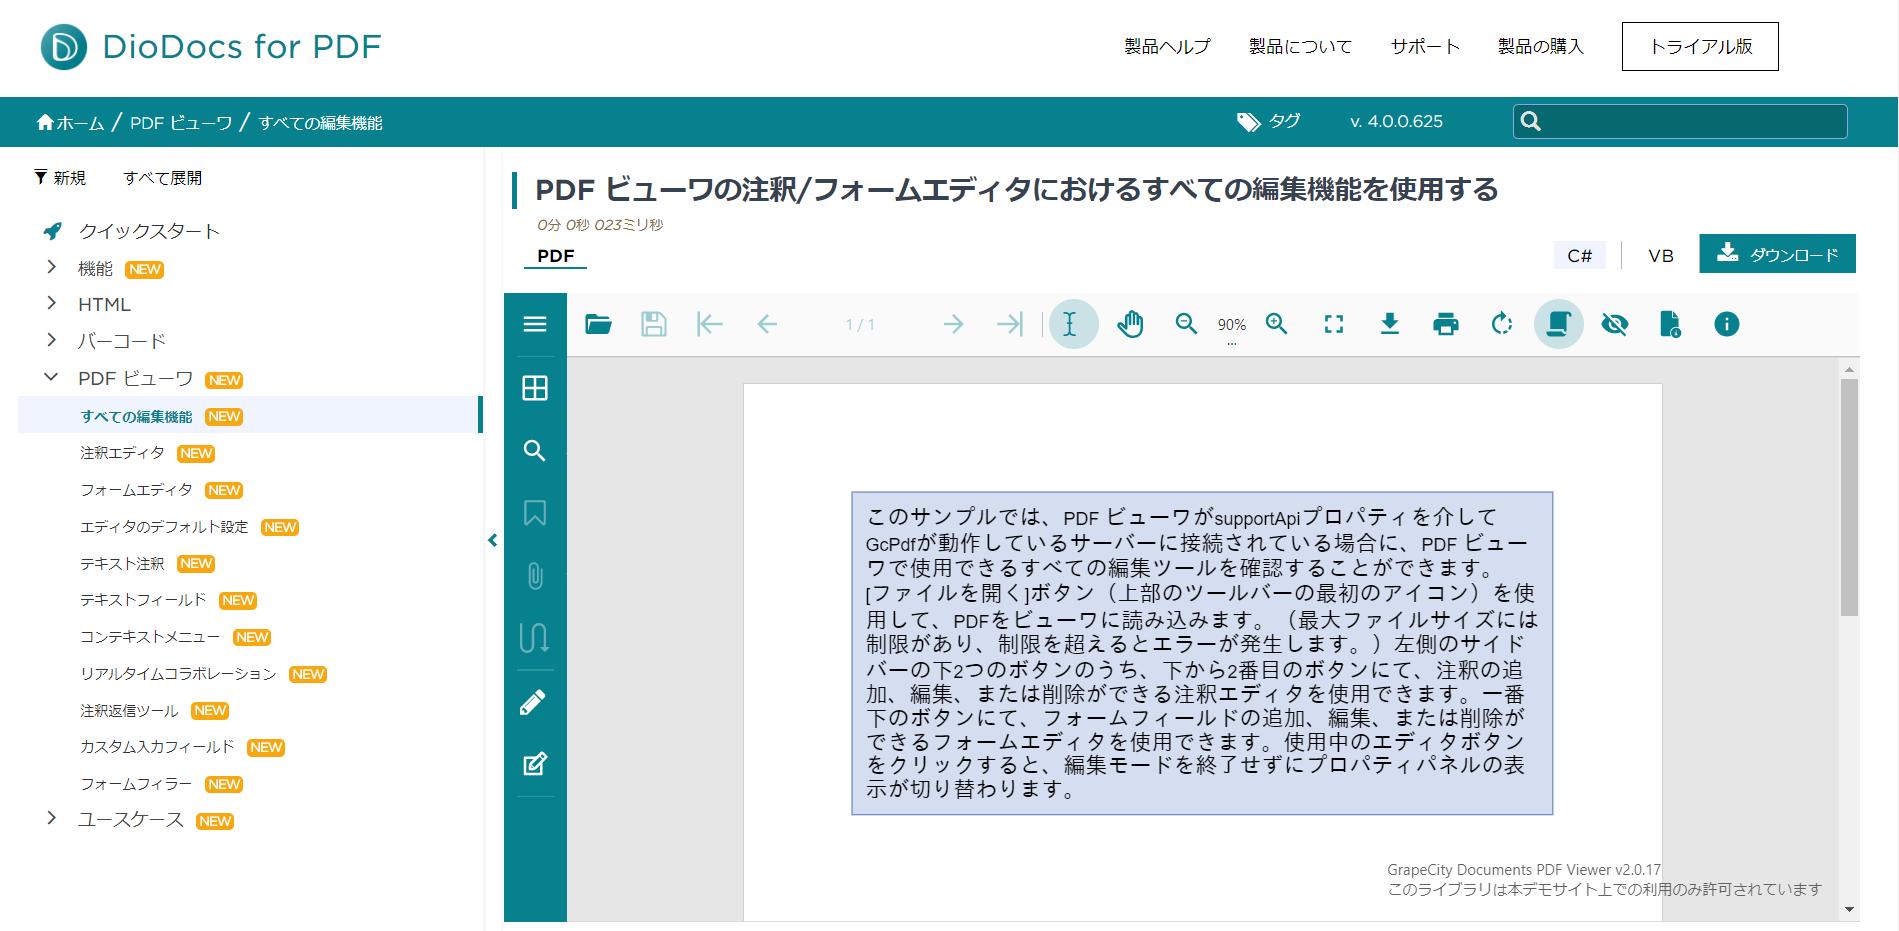 DioDocs for PDF(PDFビューワ)